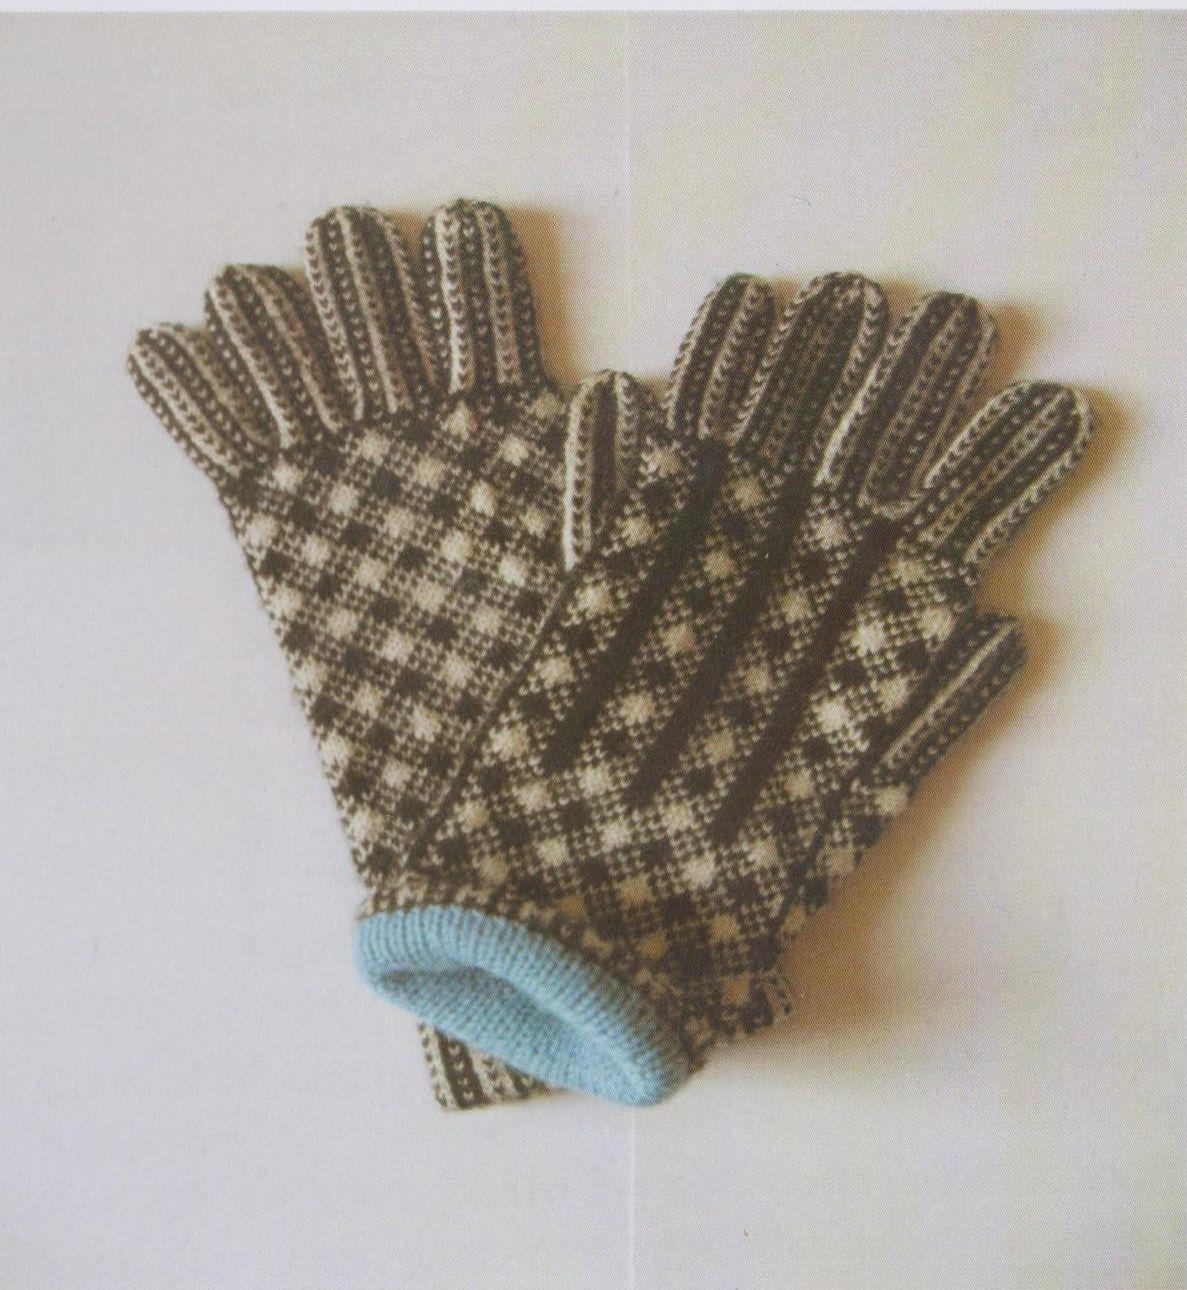 Knitting Pattern For Gloves Pdf Vintage Knitting Pattern Sanquhar Gloves Shepherds Plaid